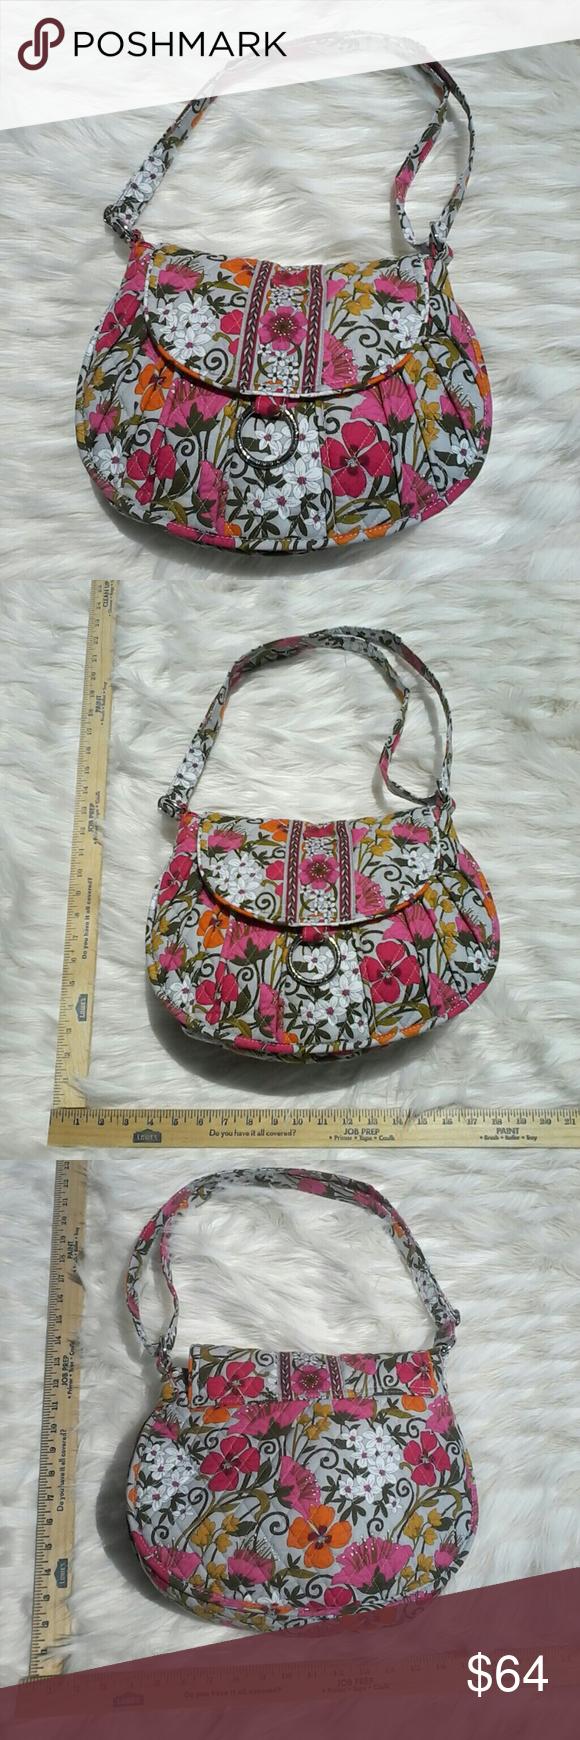 347b3c8e49e Selling this VERA BRADLEY PAISLEY CLOTH SHOLDER BAG on Poshmark! My  username is  mrbagman.  shopmycloset  poshmark  fashion  shopping  style   forsale  Vera ...